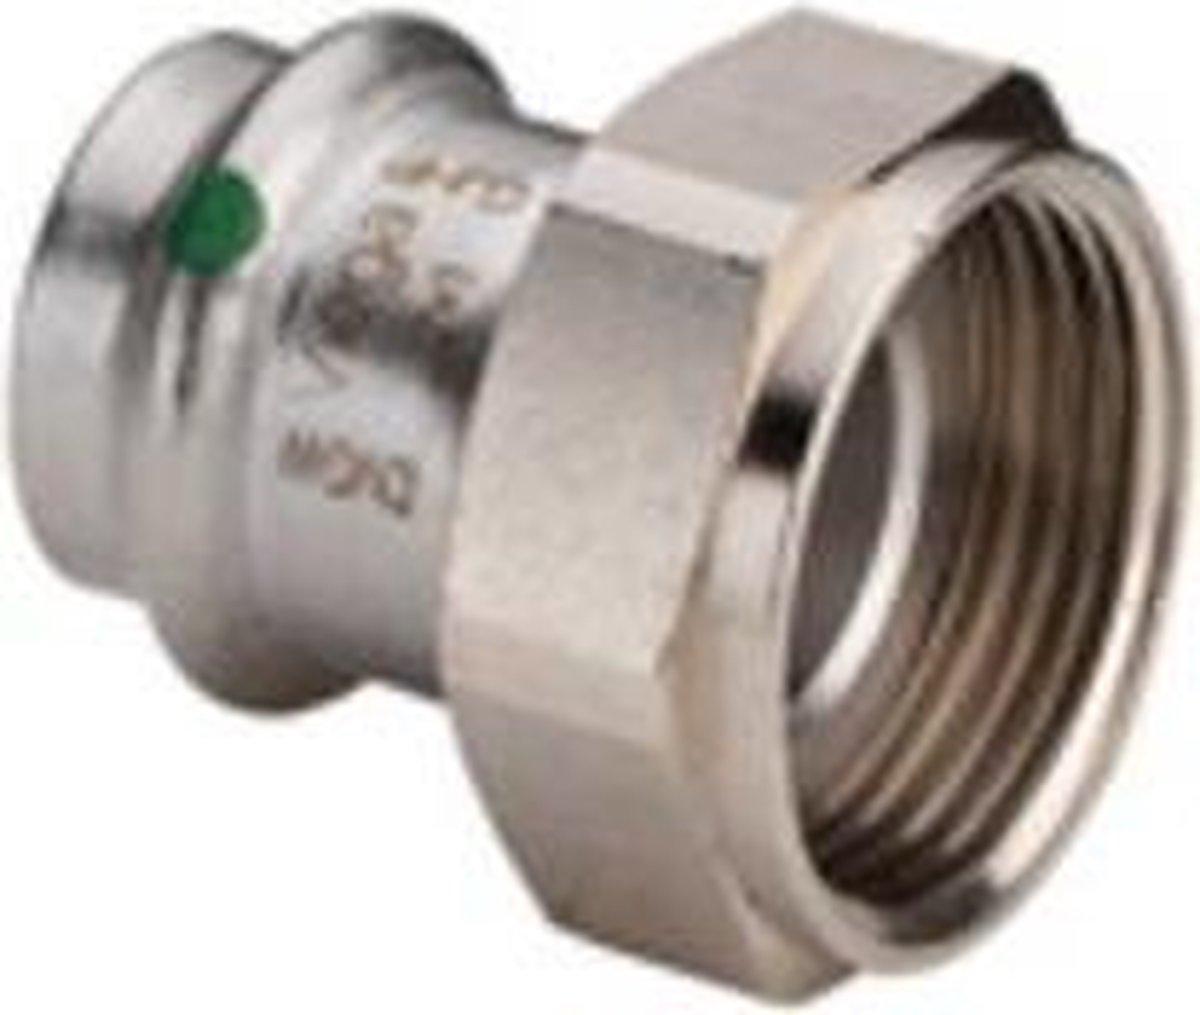 Sanpress Inox koppeling 2 delig SC pers bi.dr. 22mmx1 bi